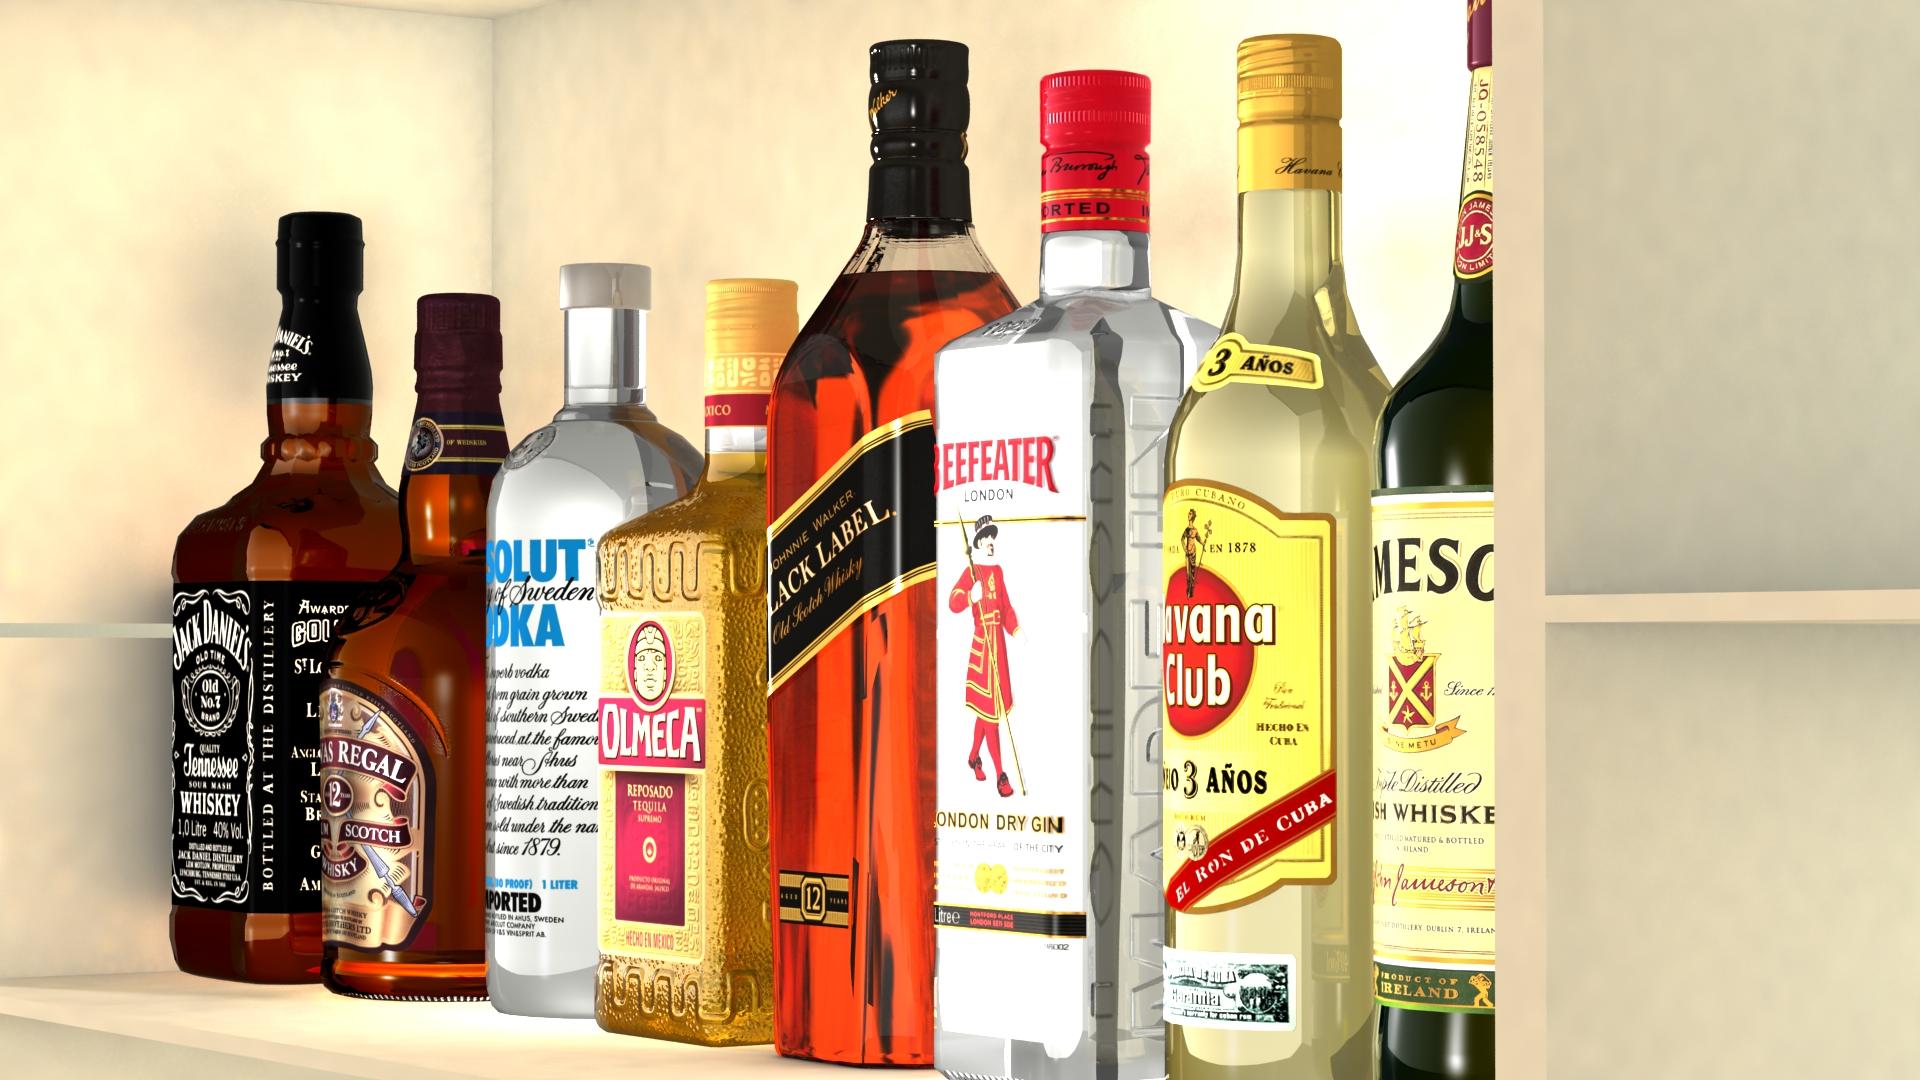 liquor bottles with bar unit interior vr/ar ready 3d model 3ds max  fbx jpeg jpg texture obj 279246